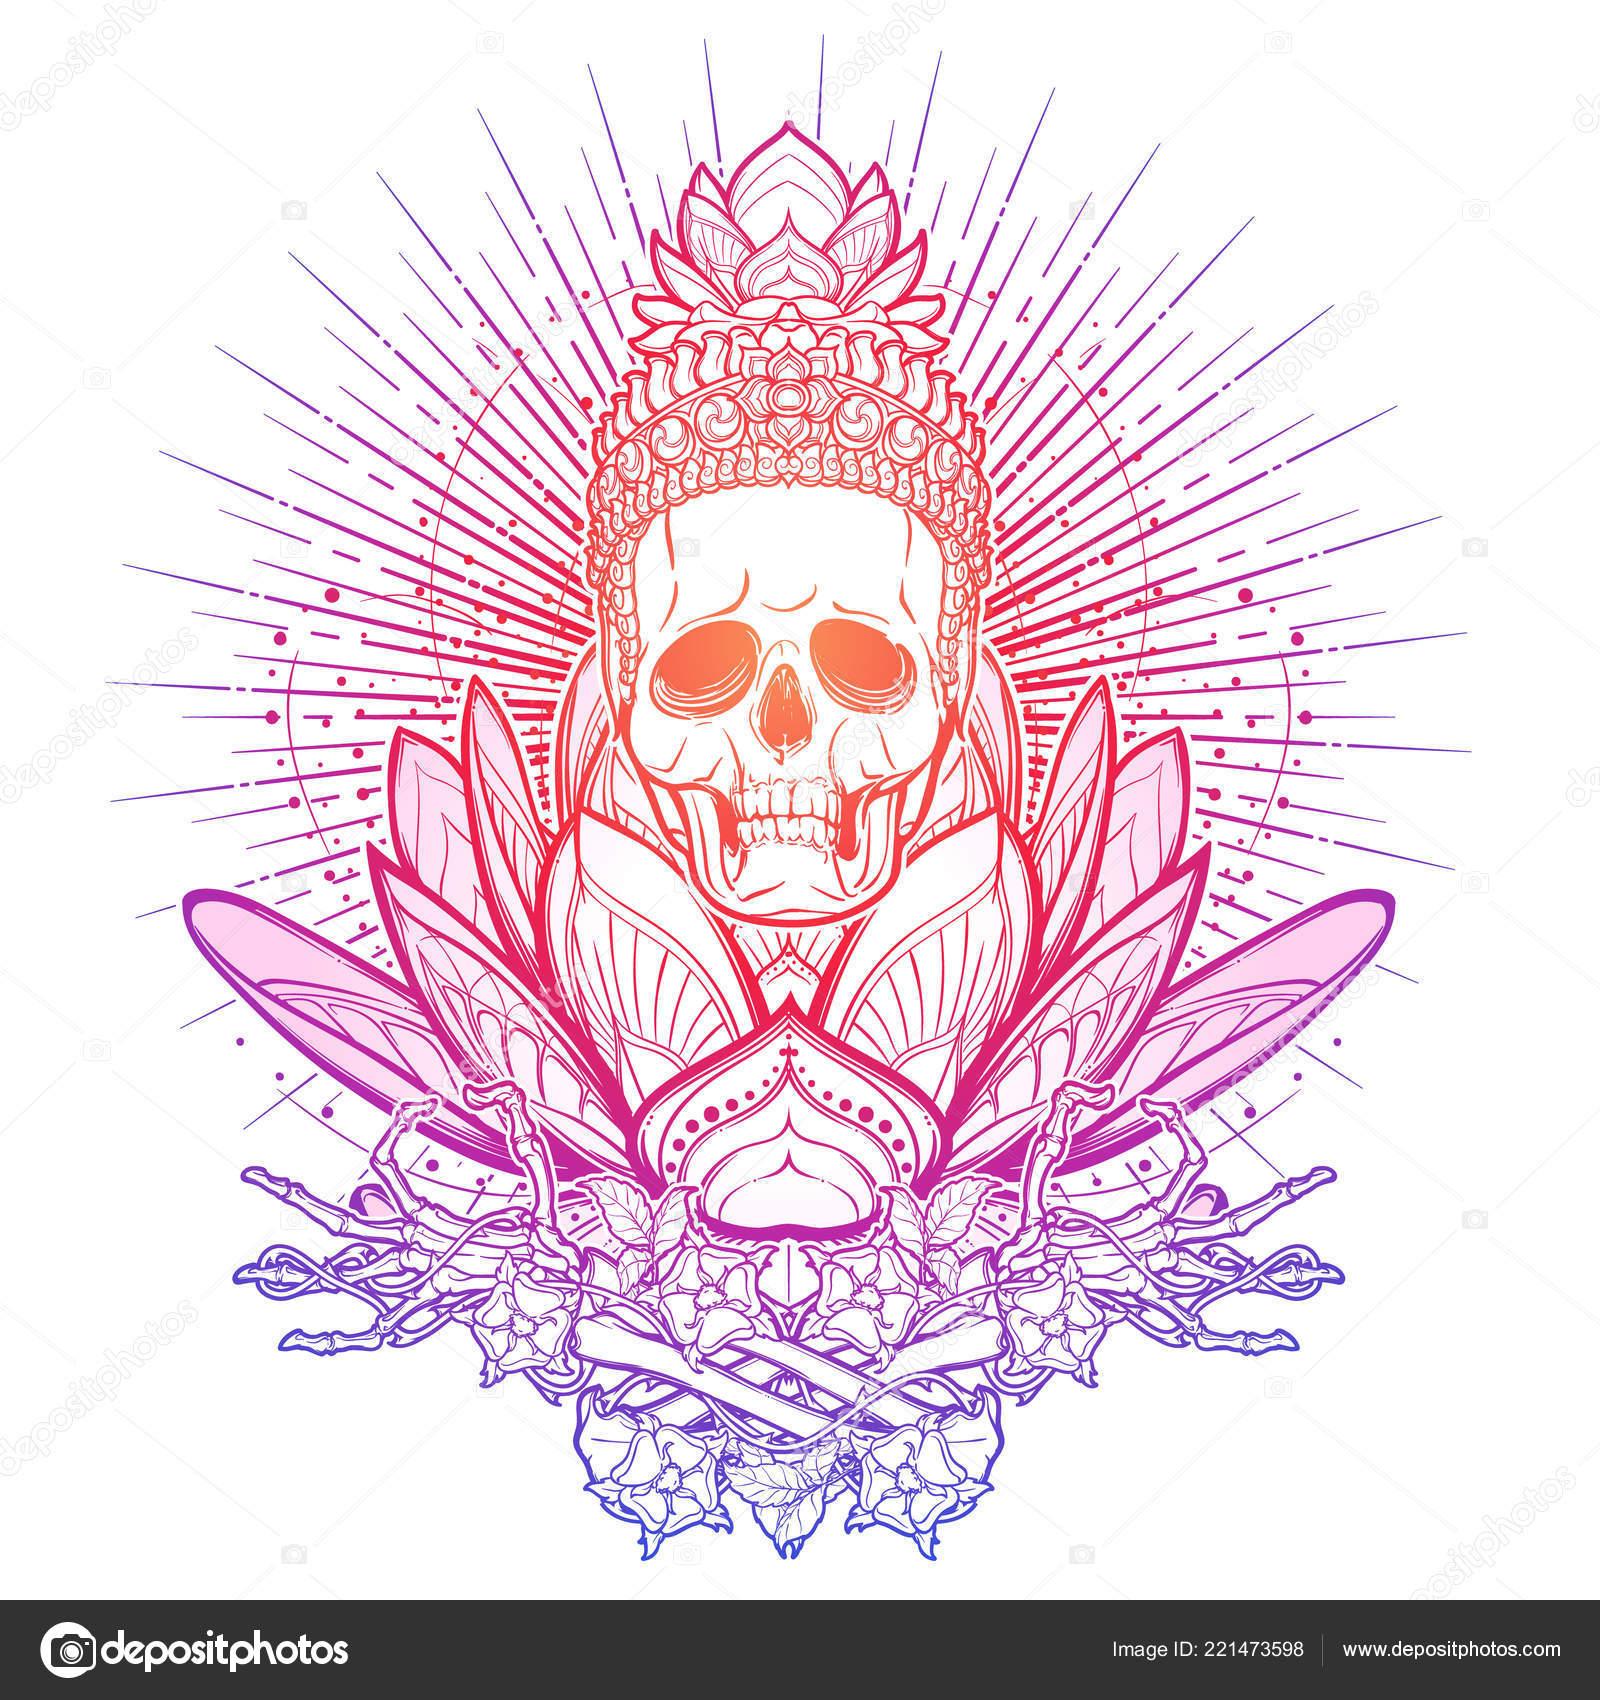 Meditating Skeleton Human Skull Hands Sacred Lotus Flower Trendy